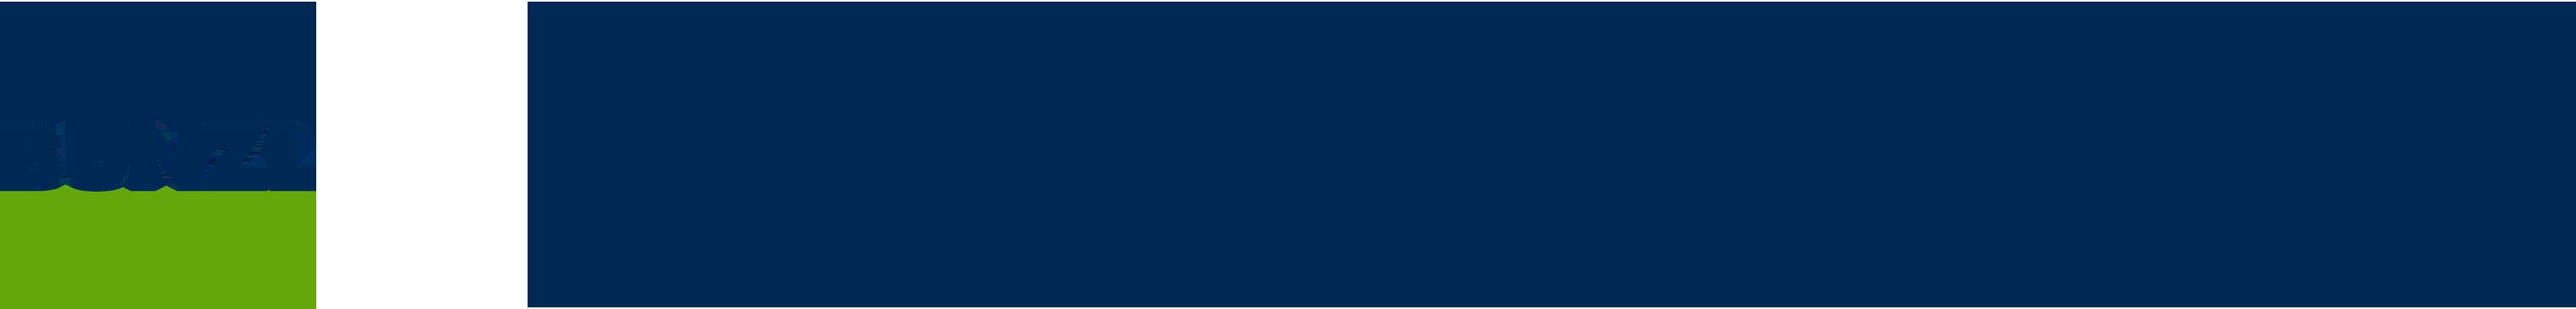 Logo_Bäumer_BUNZL